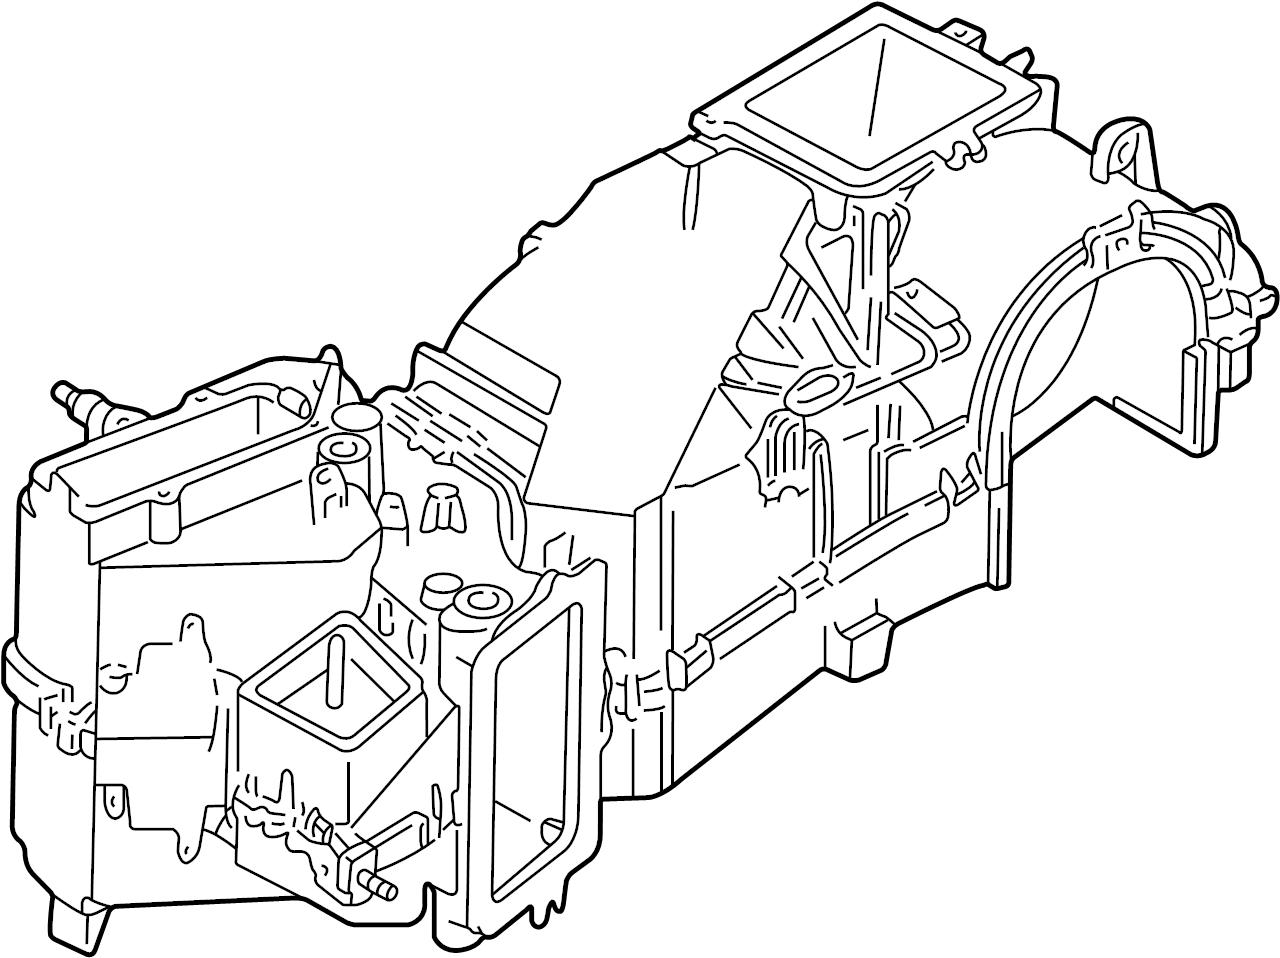 Volkswagen Cabrio Evaporator Evaporator Core Includes Housing Assy